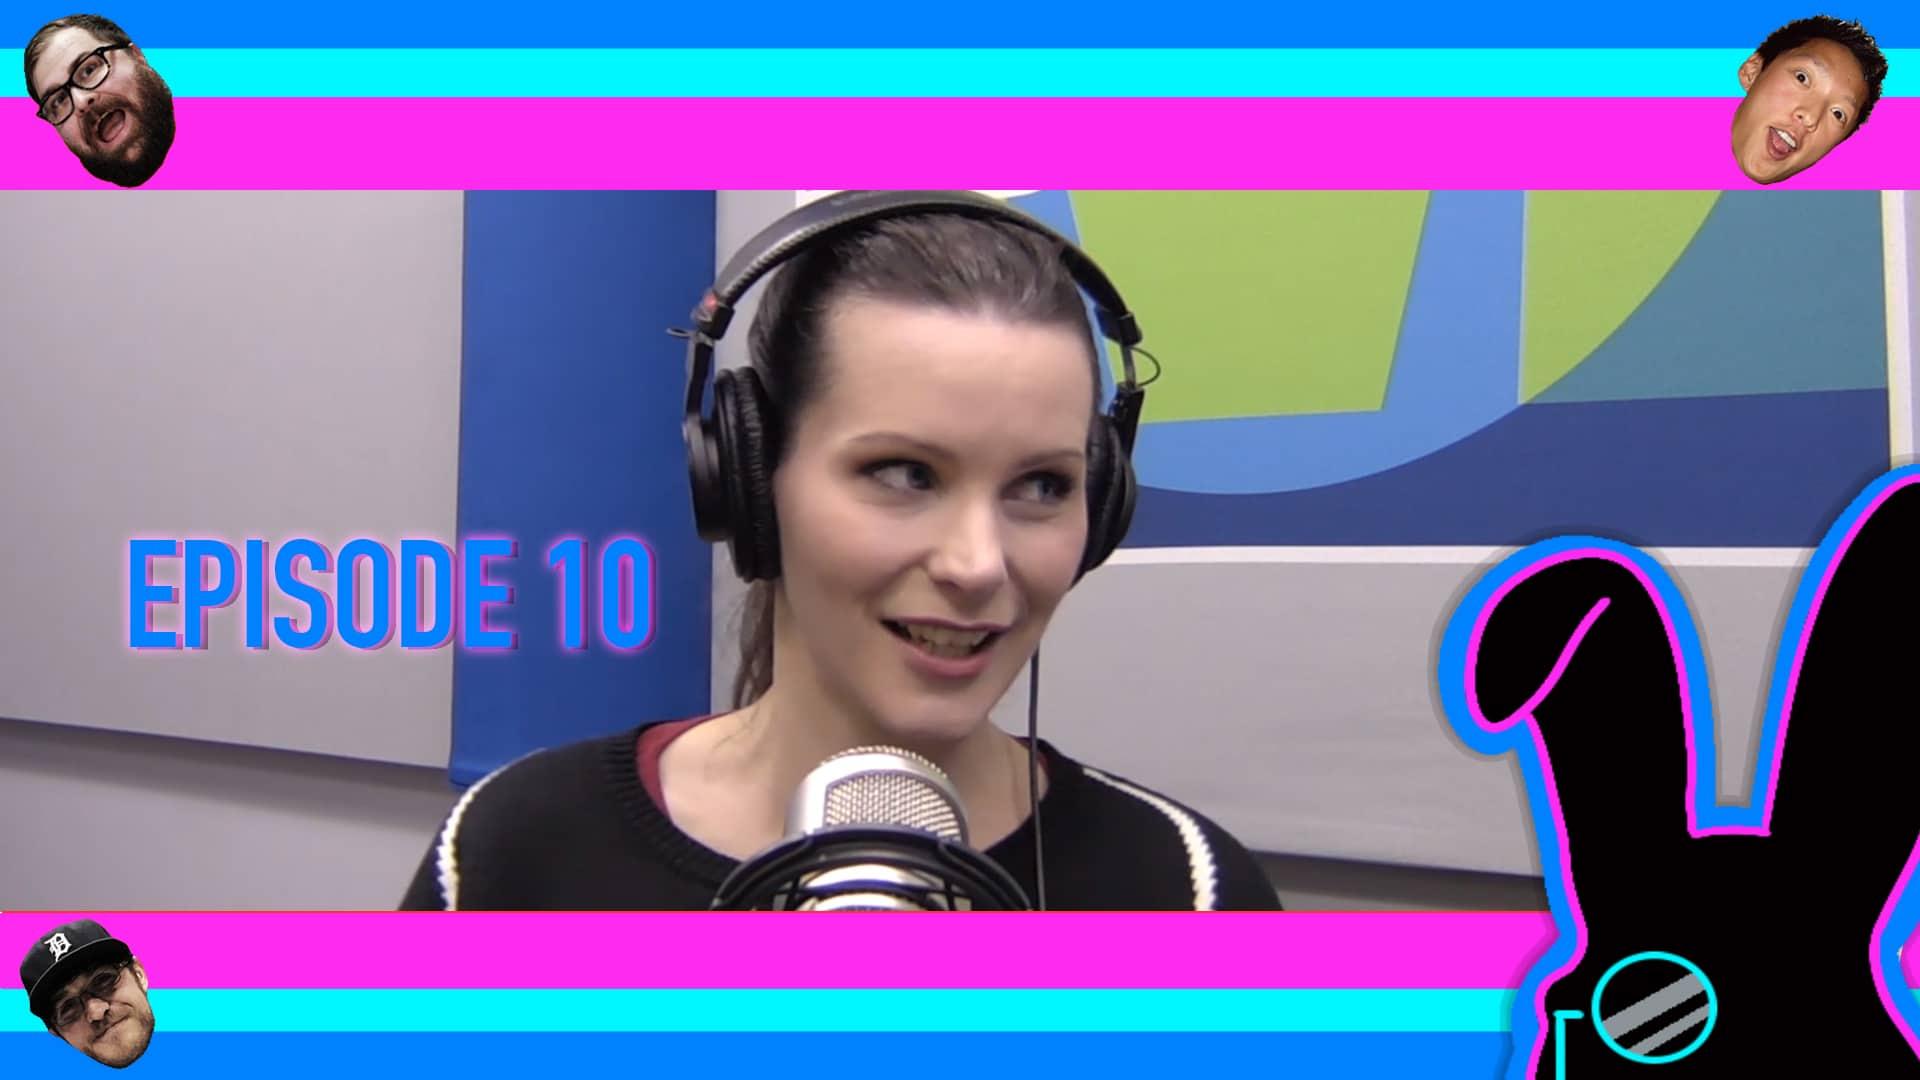 Geektainment Weekly - Episode 10